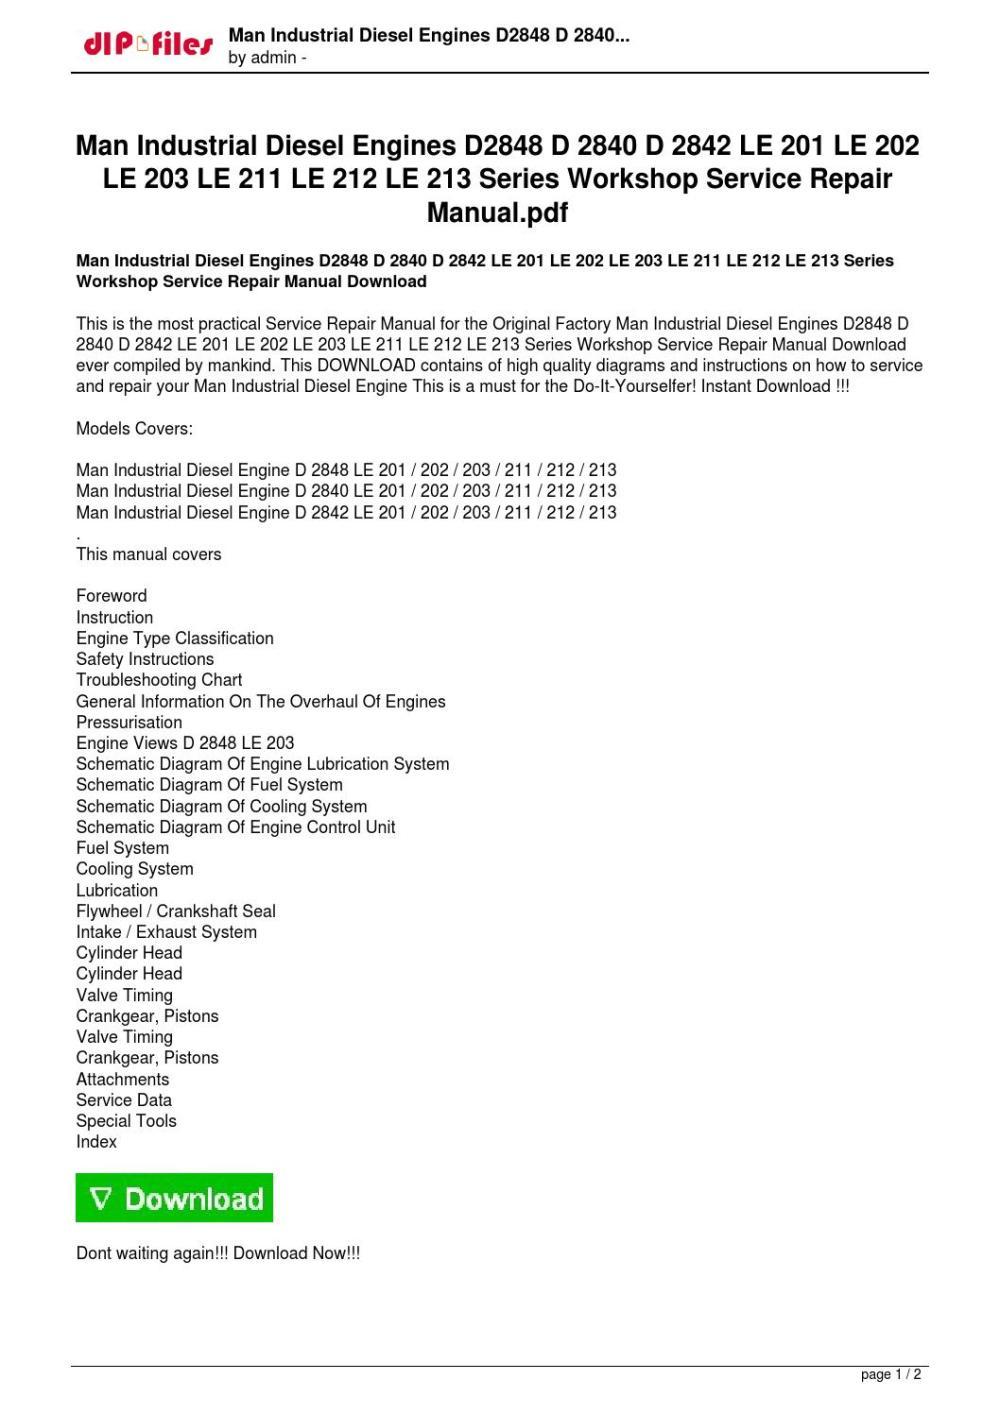 medium resolution of man industrial diesel engines d2848 d 2840 d 2842 le 201 le 202 le 203 le 211 le 212 le 213 series w by jierui kong issuu